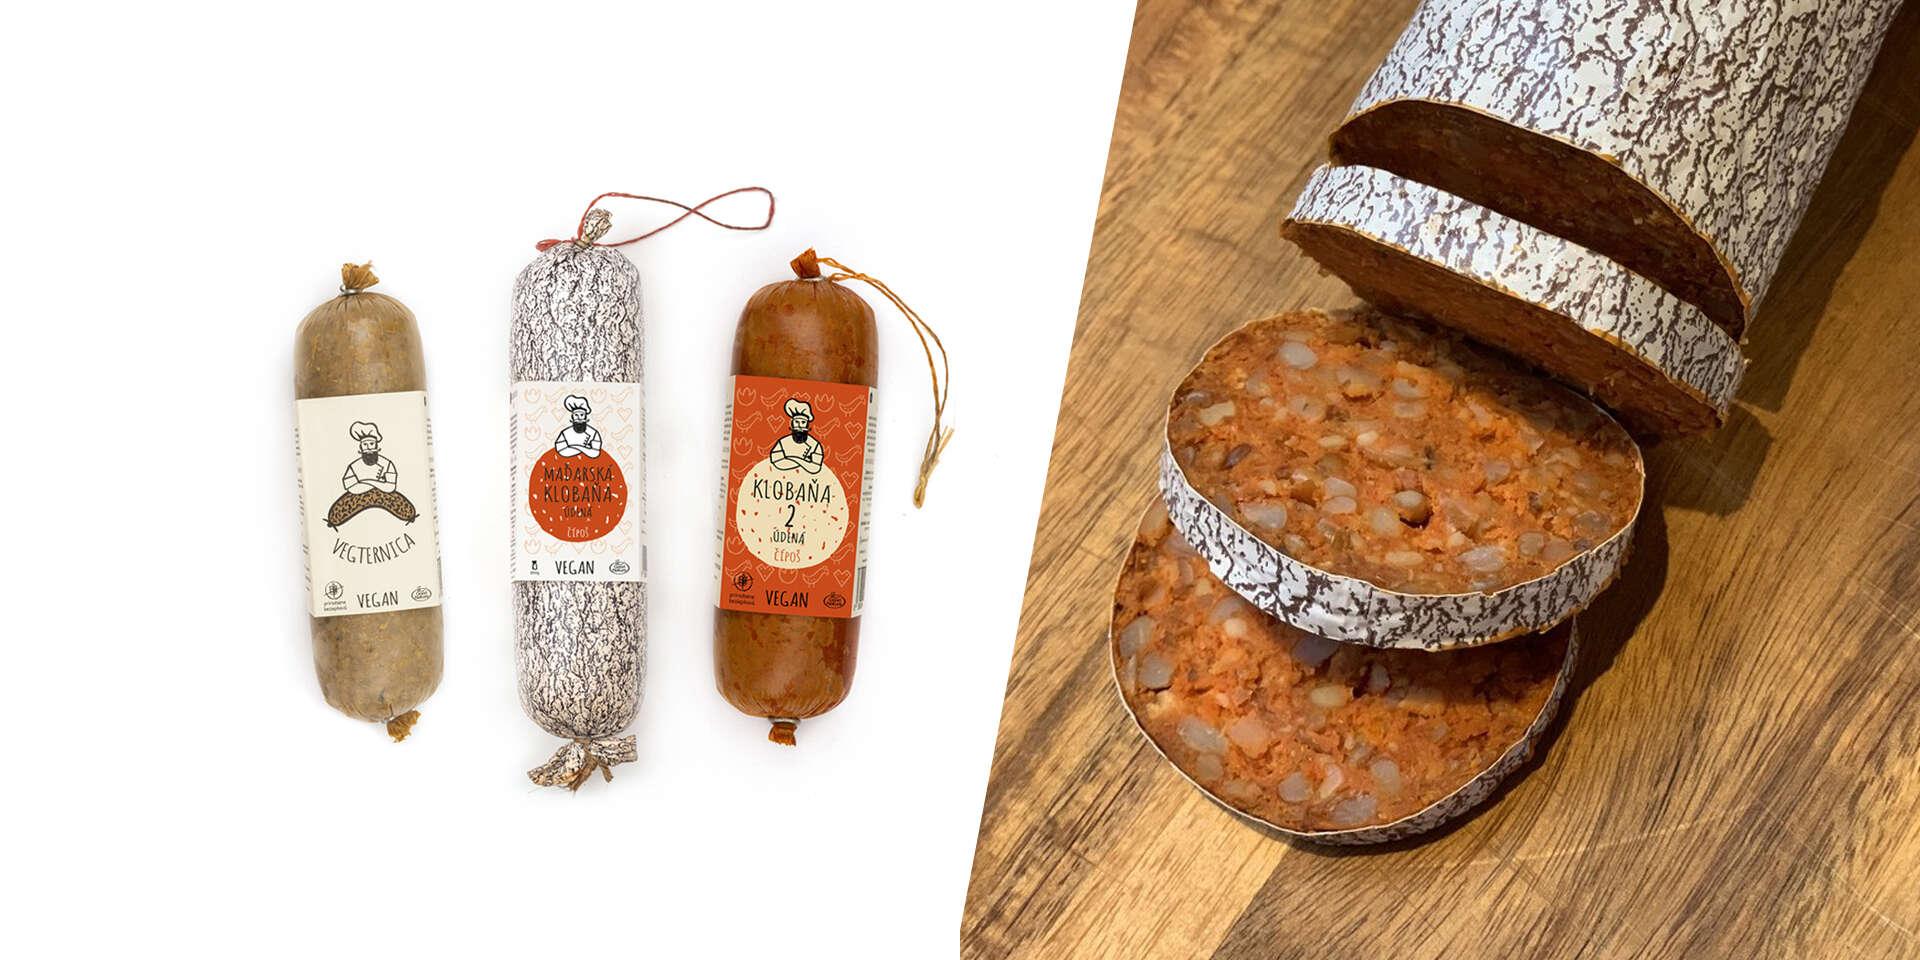 NOVINKA: Vegánske klobásky a jaternice s autentickou chuťou (100 % prírodné)